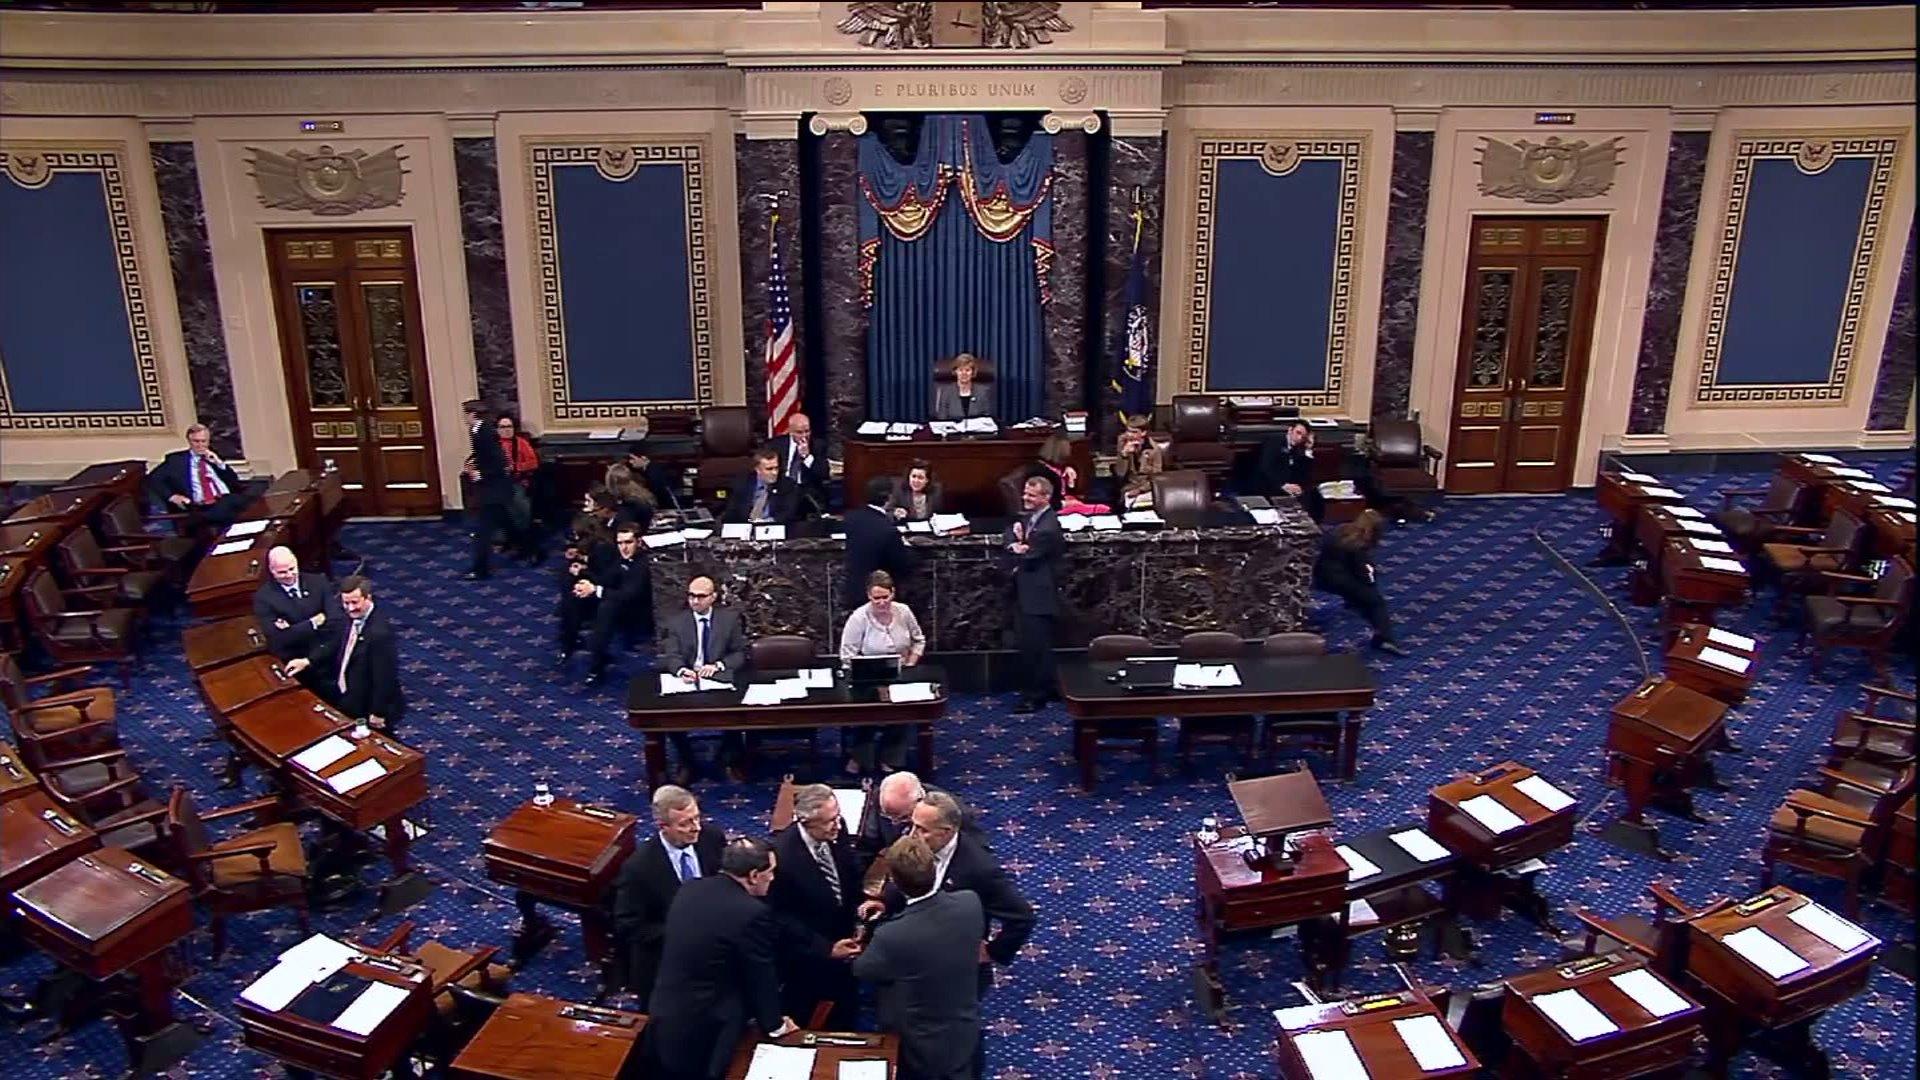 Image result for PHOTOS OF GOP US SENATORS ON SENATE FLOOR